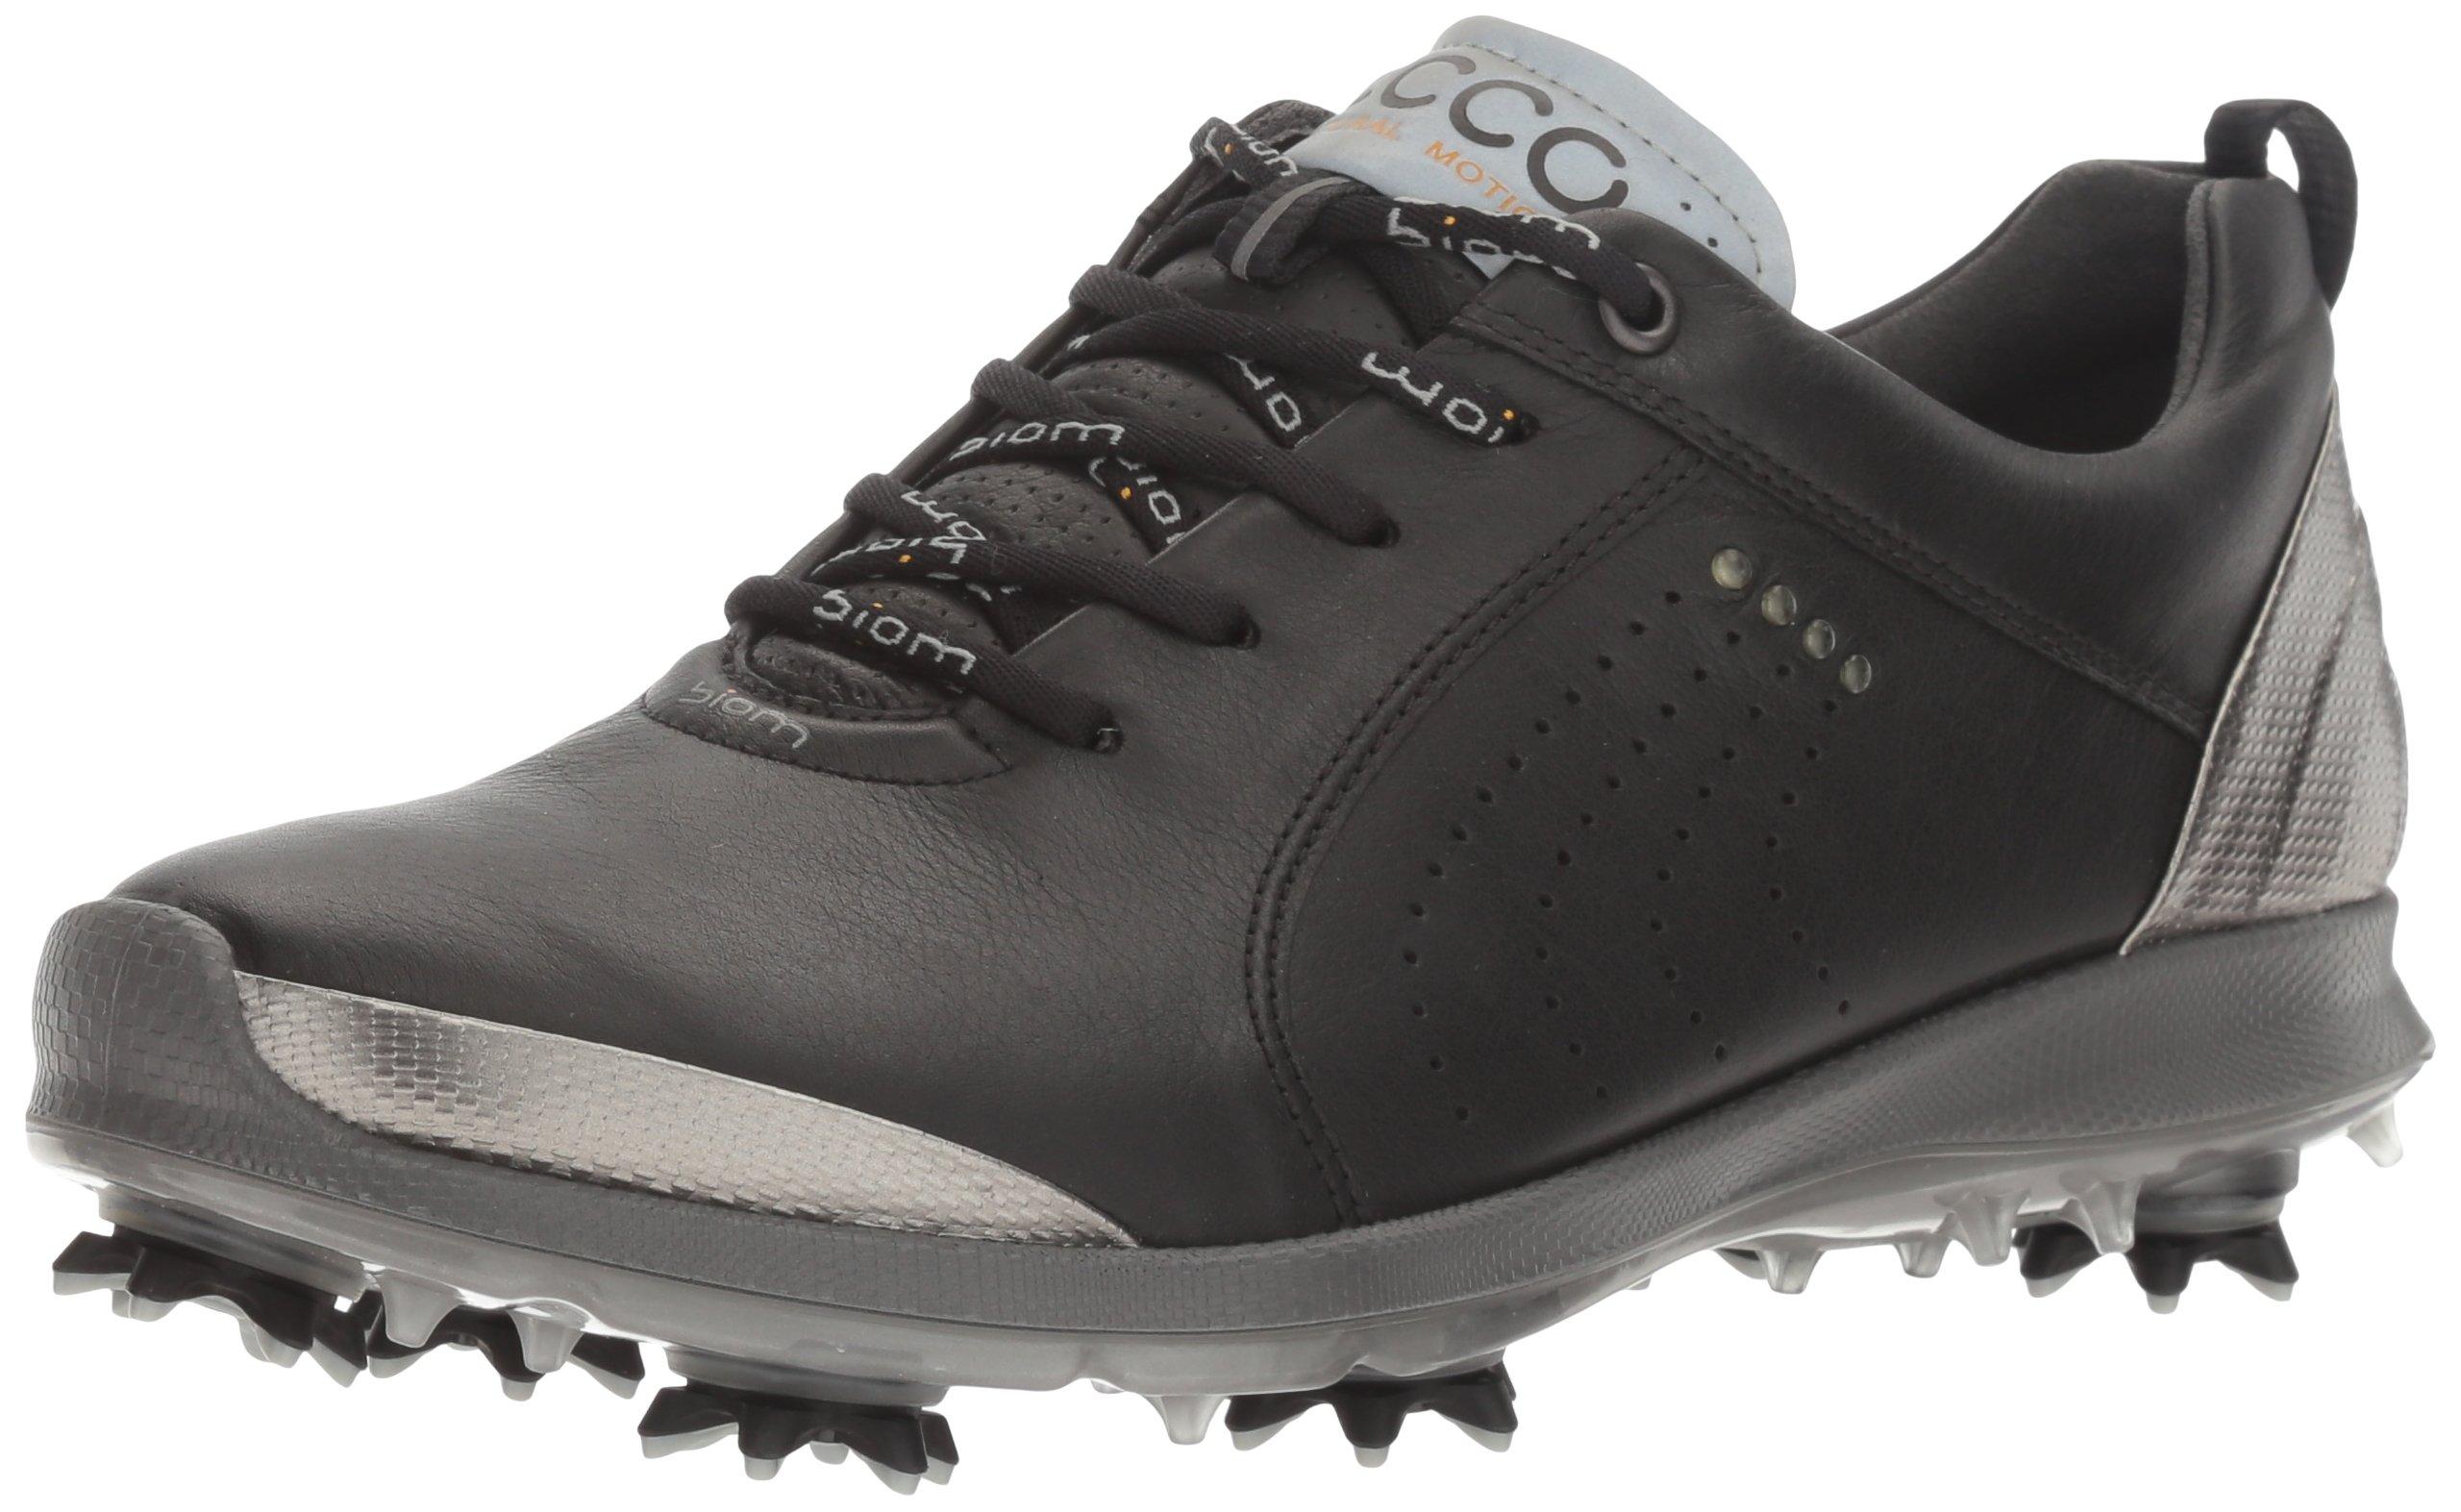 ECCO Women's BOIM G 2 Free Golf Shoe, Black/Buffed Silver, 5 M US by ECCO